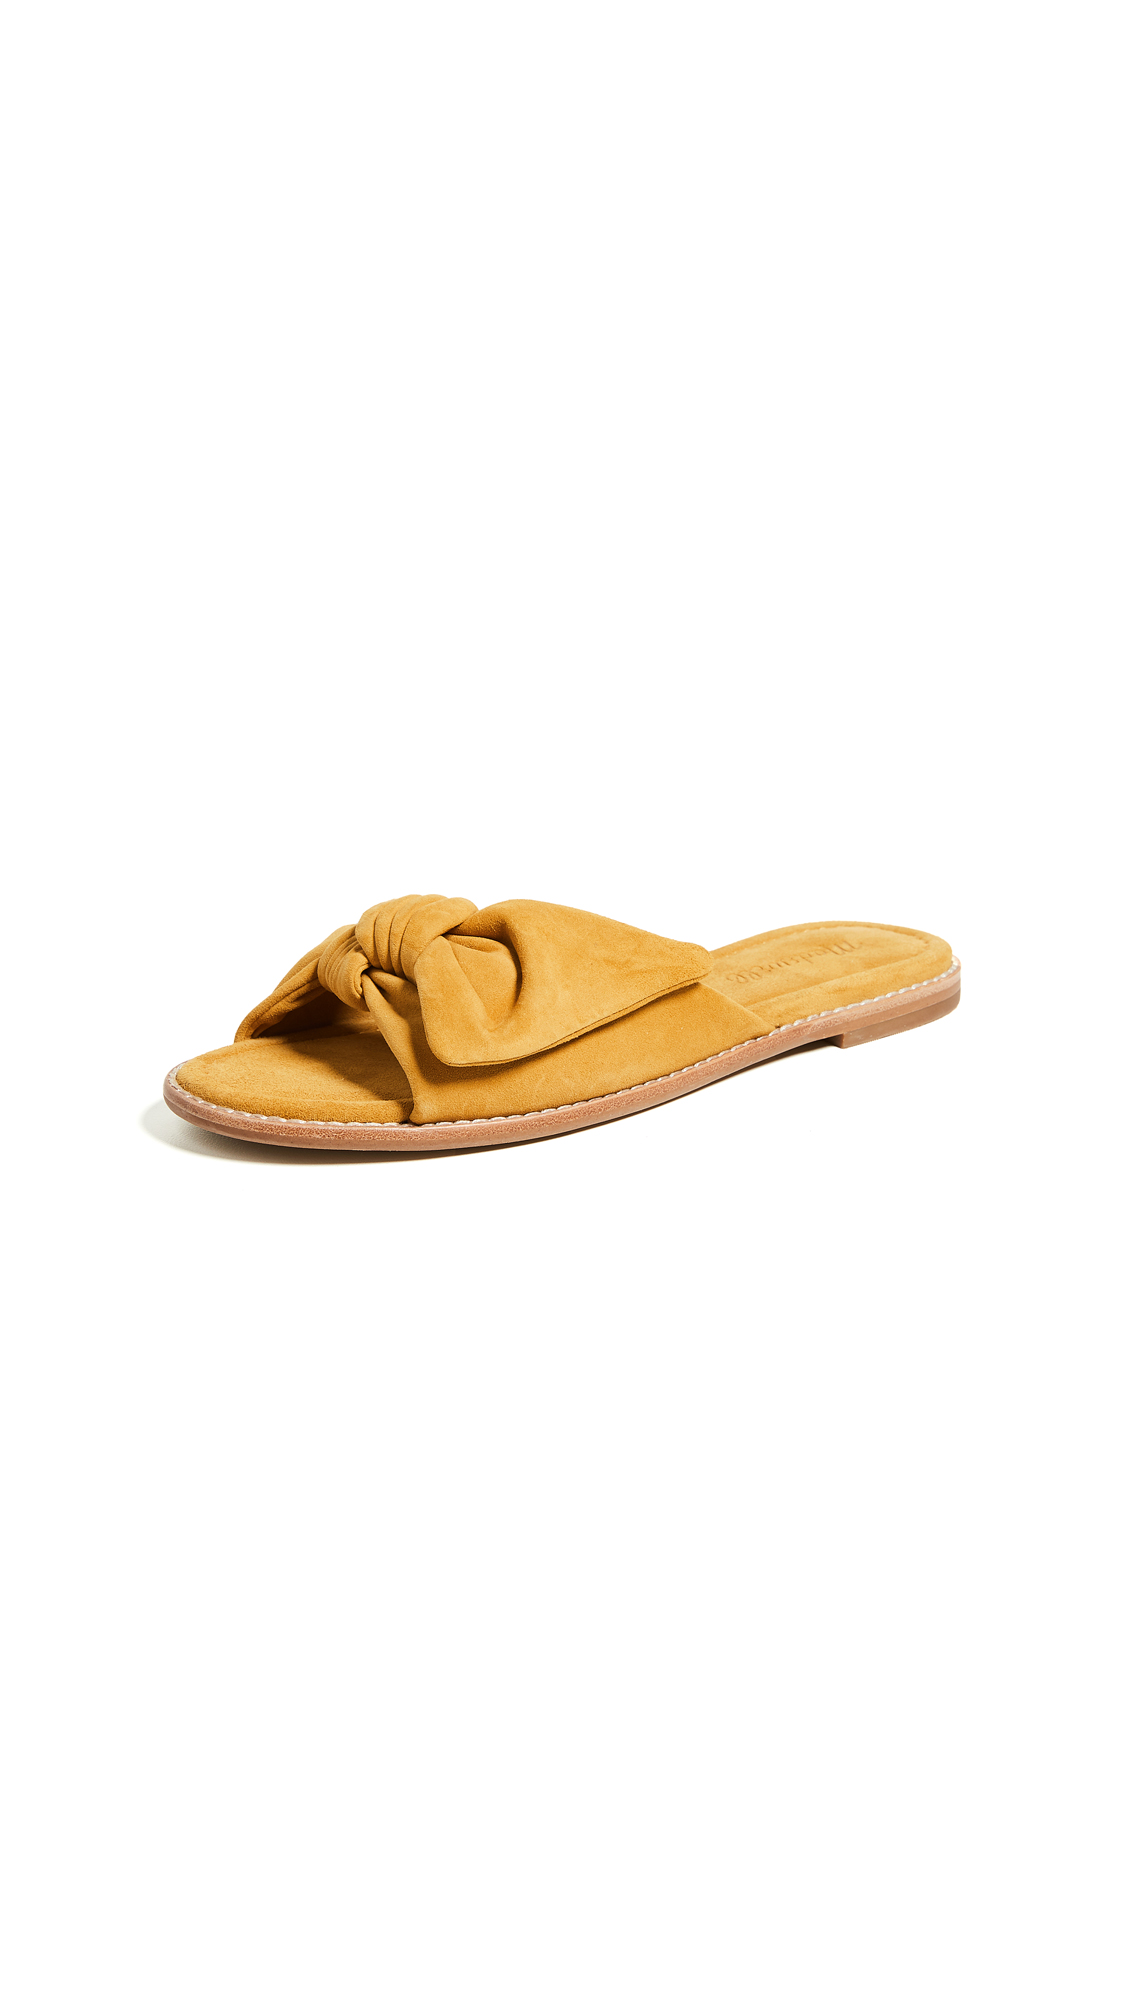 Madewell Jaclyn Half Bow Sandals - Cider